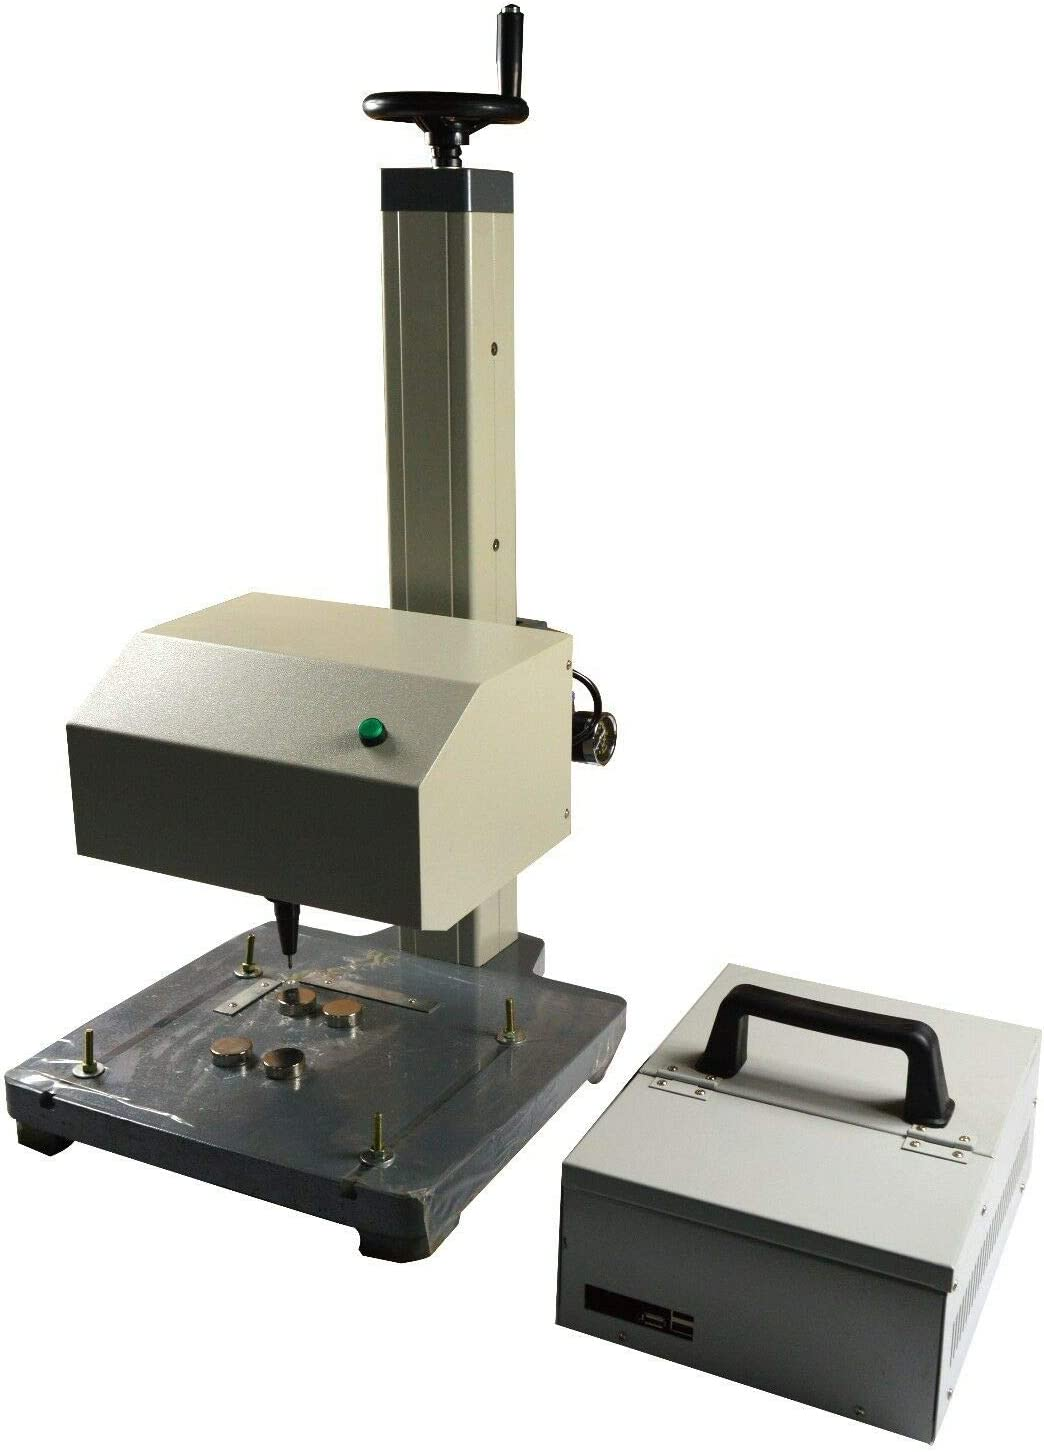 INTBUYING 7 Touch Screen Pneumatic Dot Peen Marking Machine Metal Print